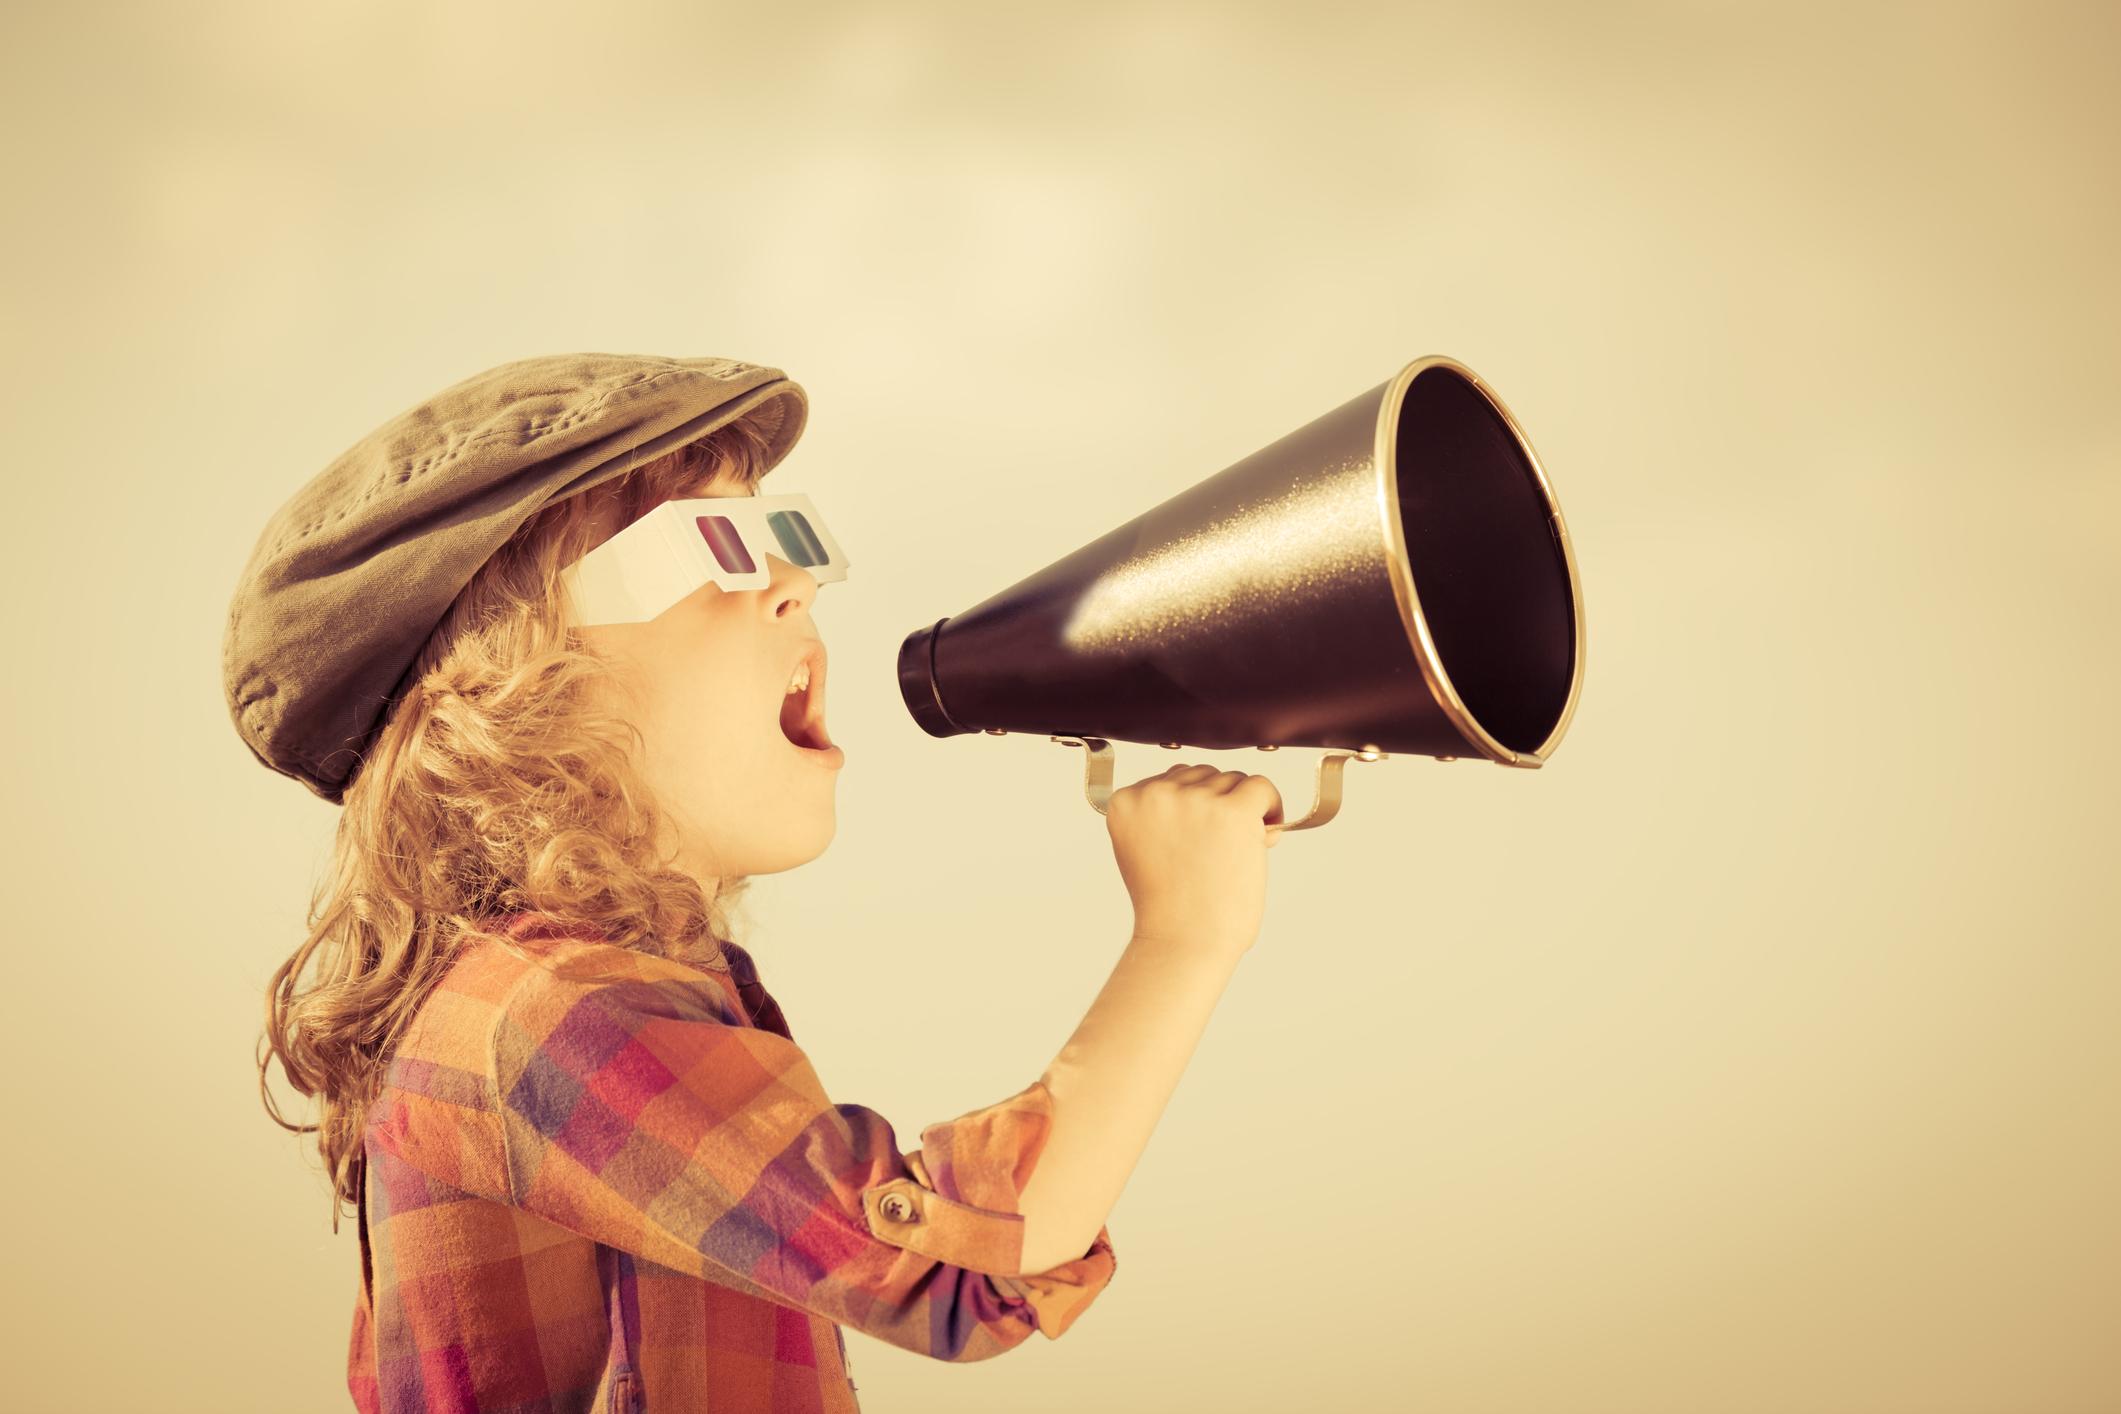 Bambino urla al megafono